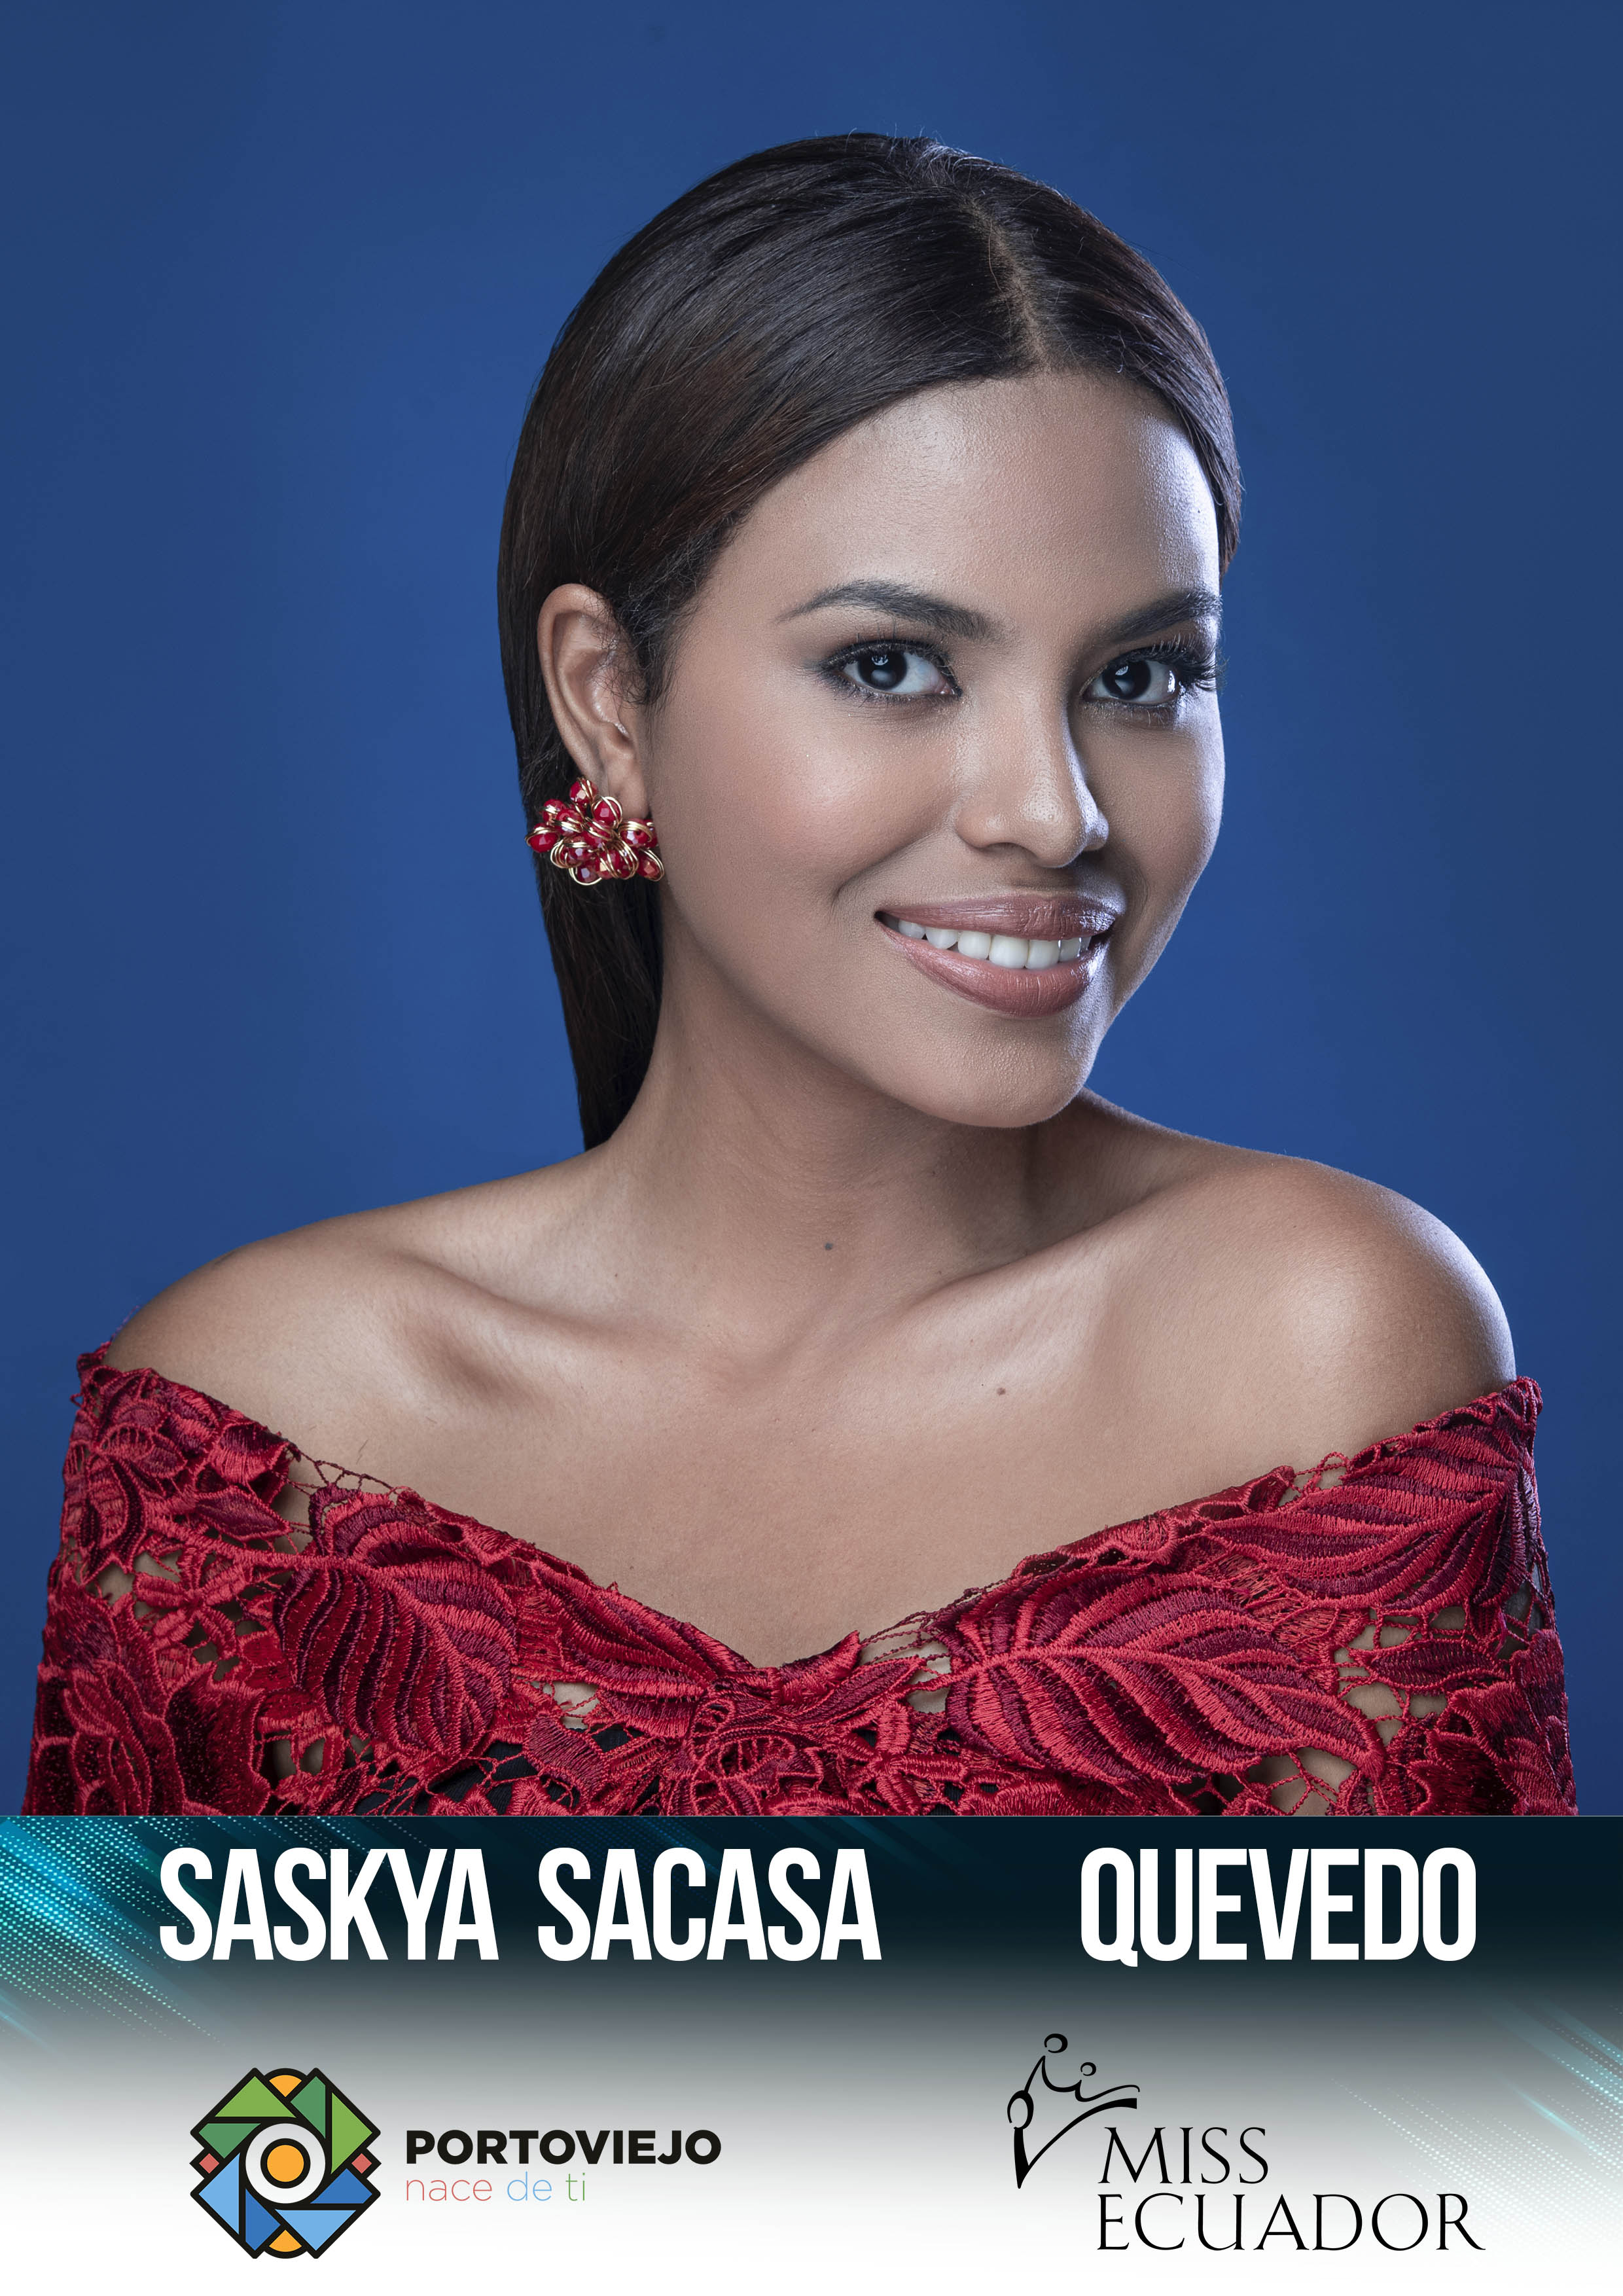 Miss Ecuador 2020 9-saskya-sacasa.2